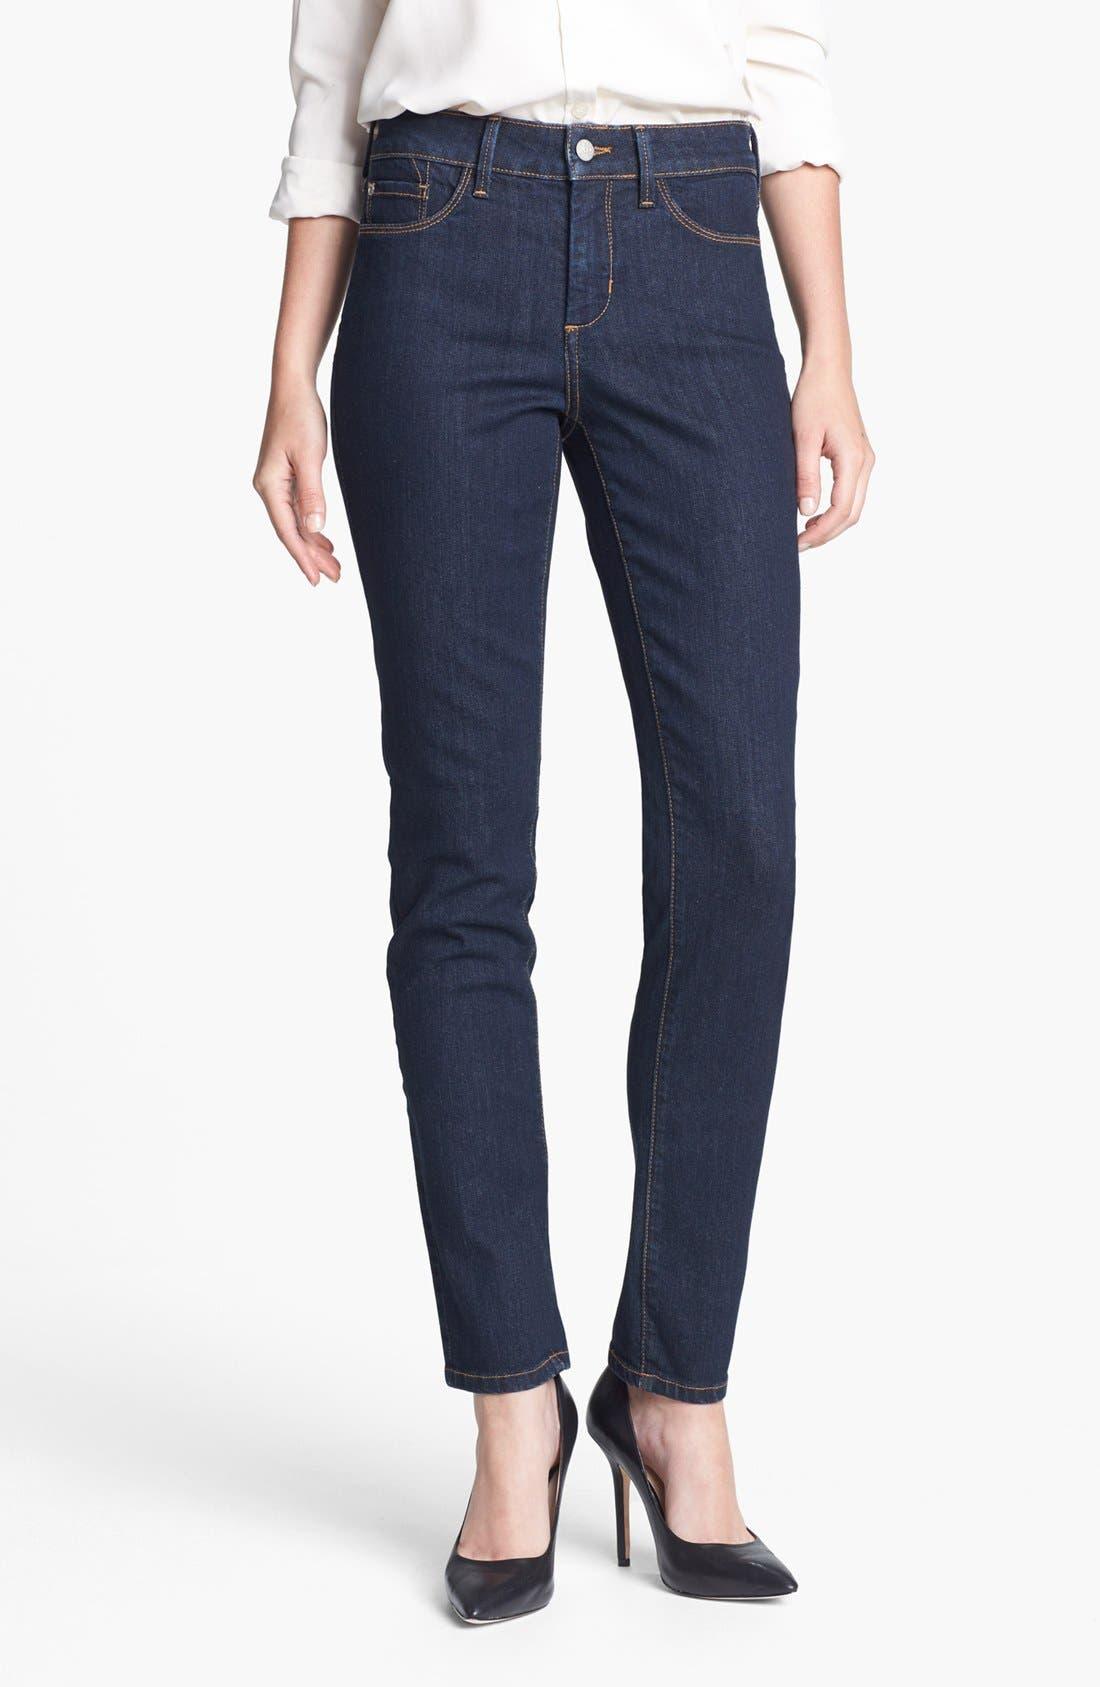 Alternate Image 1 Selected - NYDJ 'Alina' Stretch Skinny Jeans (Larchmont) (Regular & Petite)